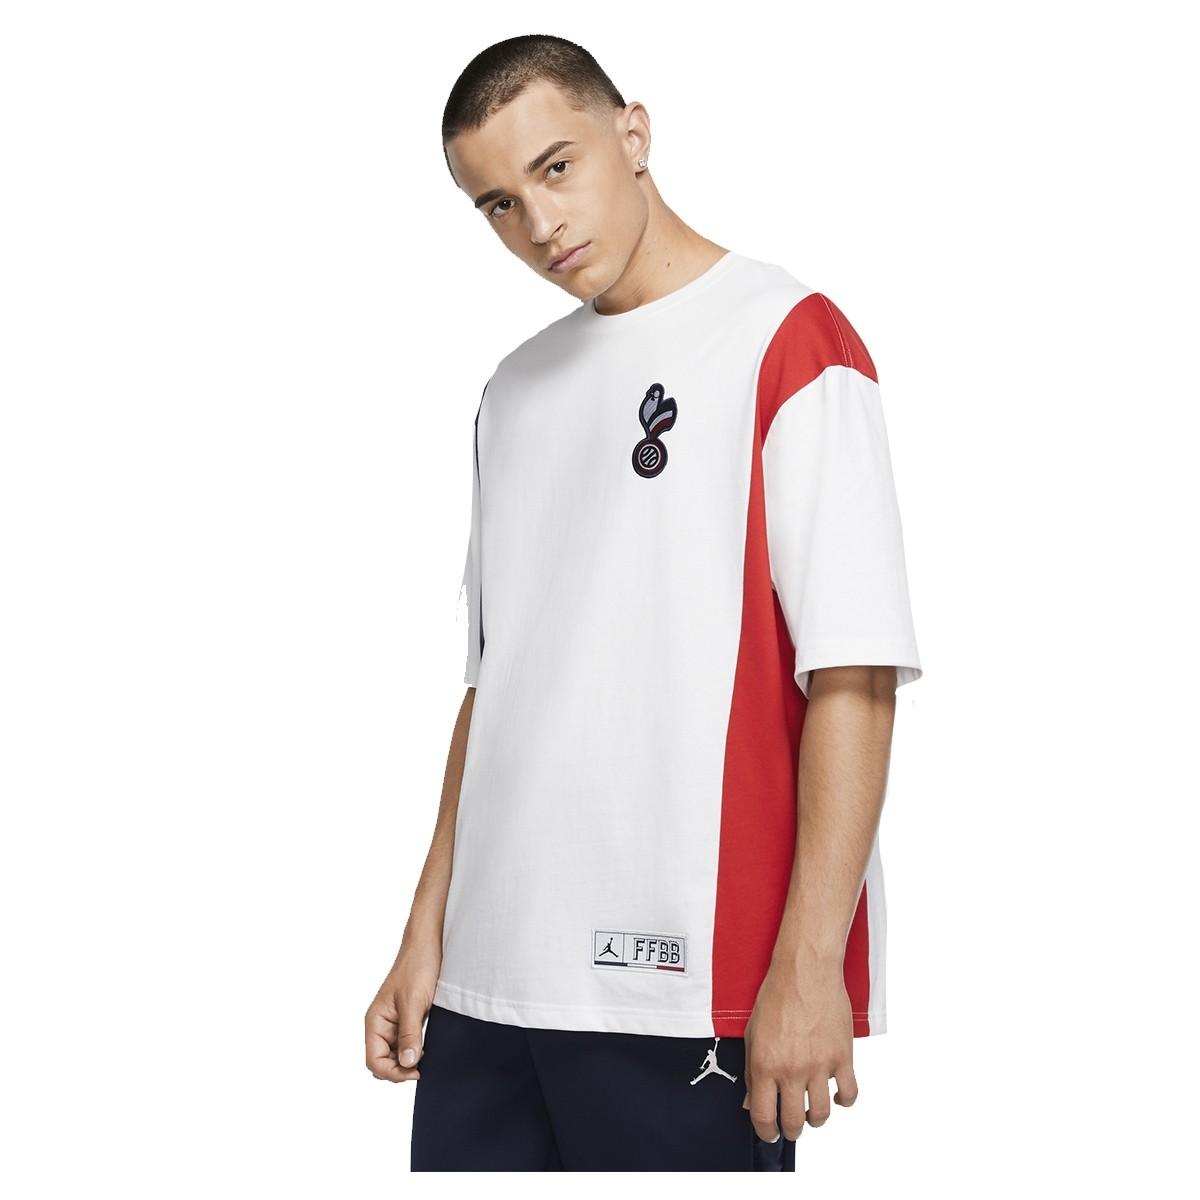 Francia Jordan Tee 'White'